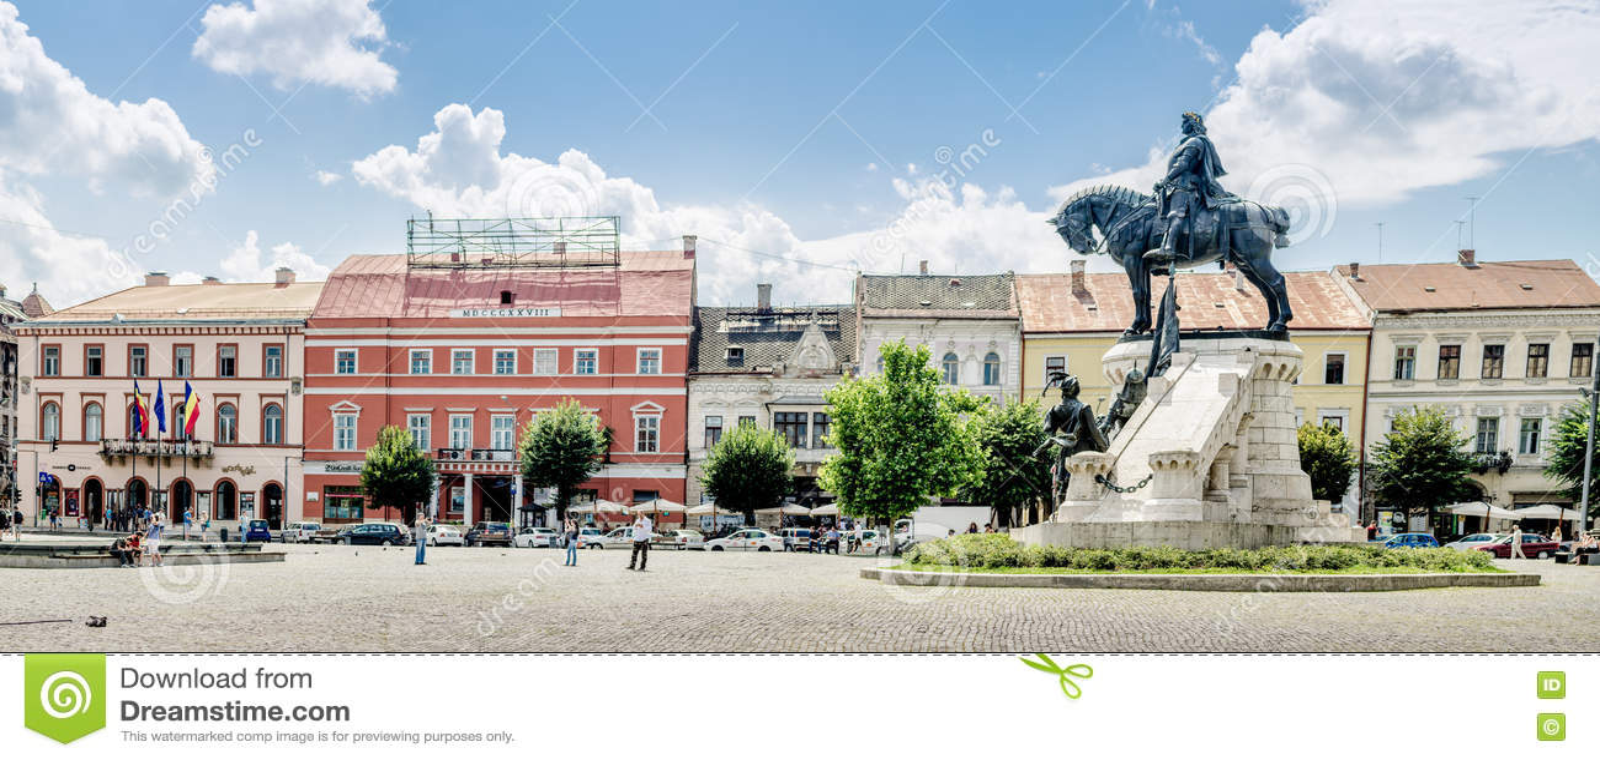 Matei Corvin ( Matthias Corvinus Rex ) statue in the central Unirii Square in Cluj-Napoca